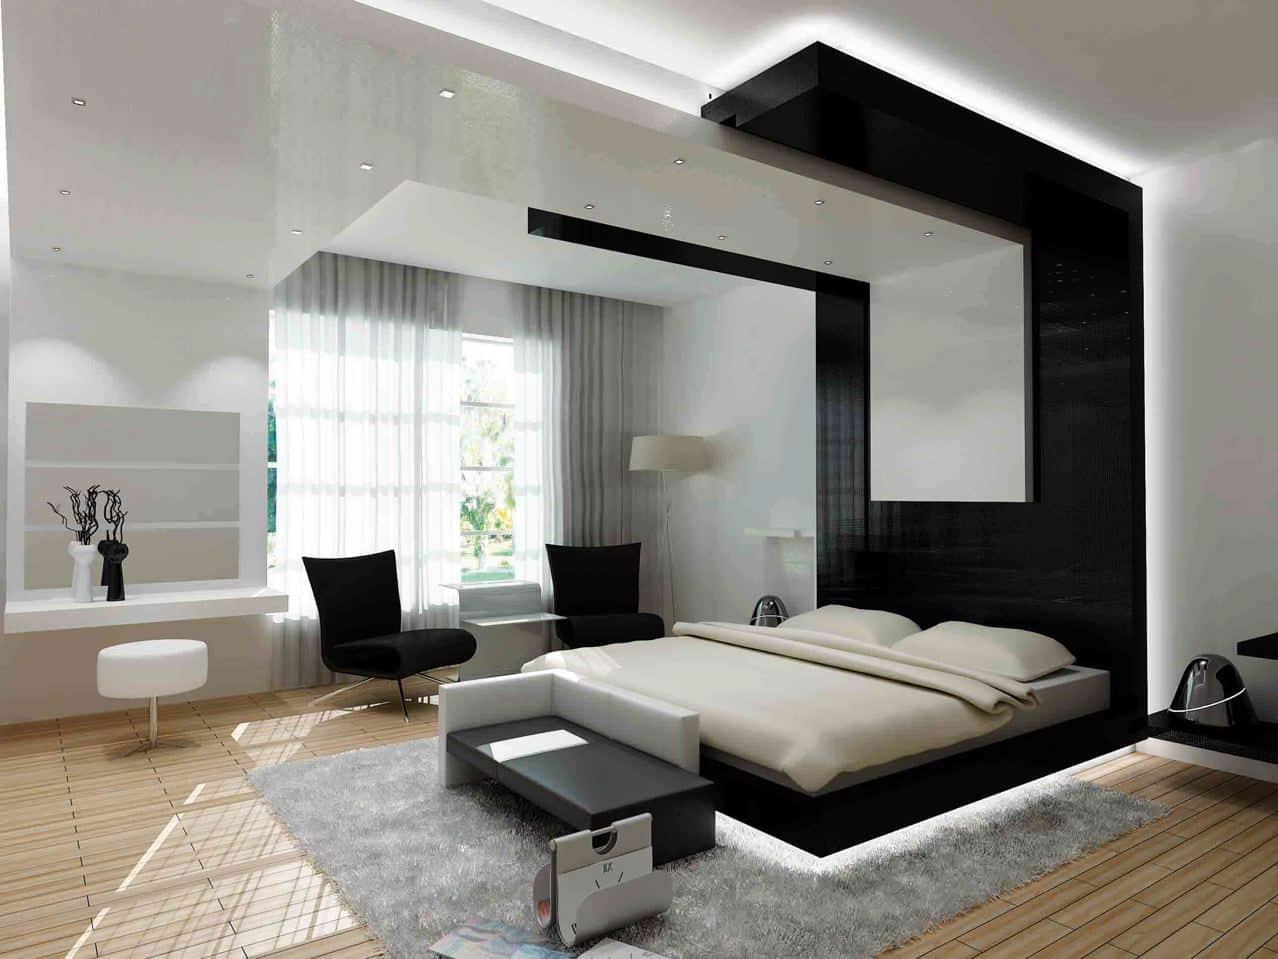 25 inspirational modern bedroom ideas modern contemporary bedroom designs